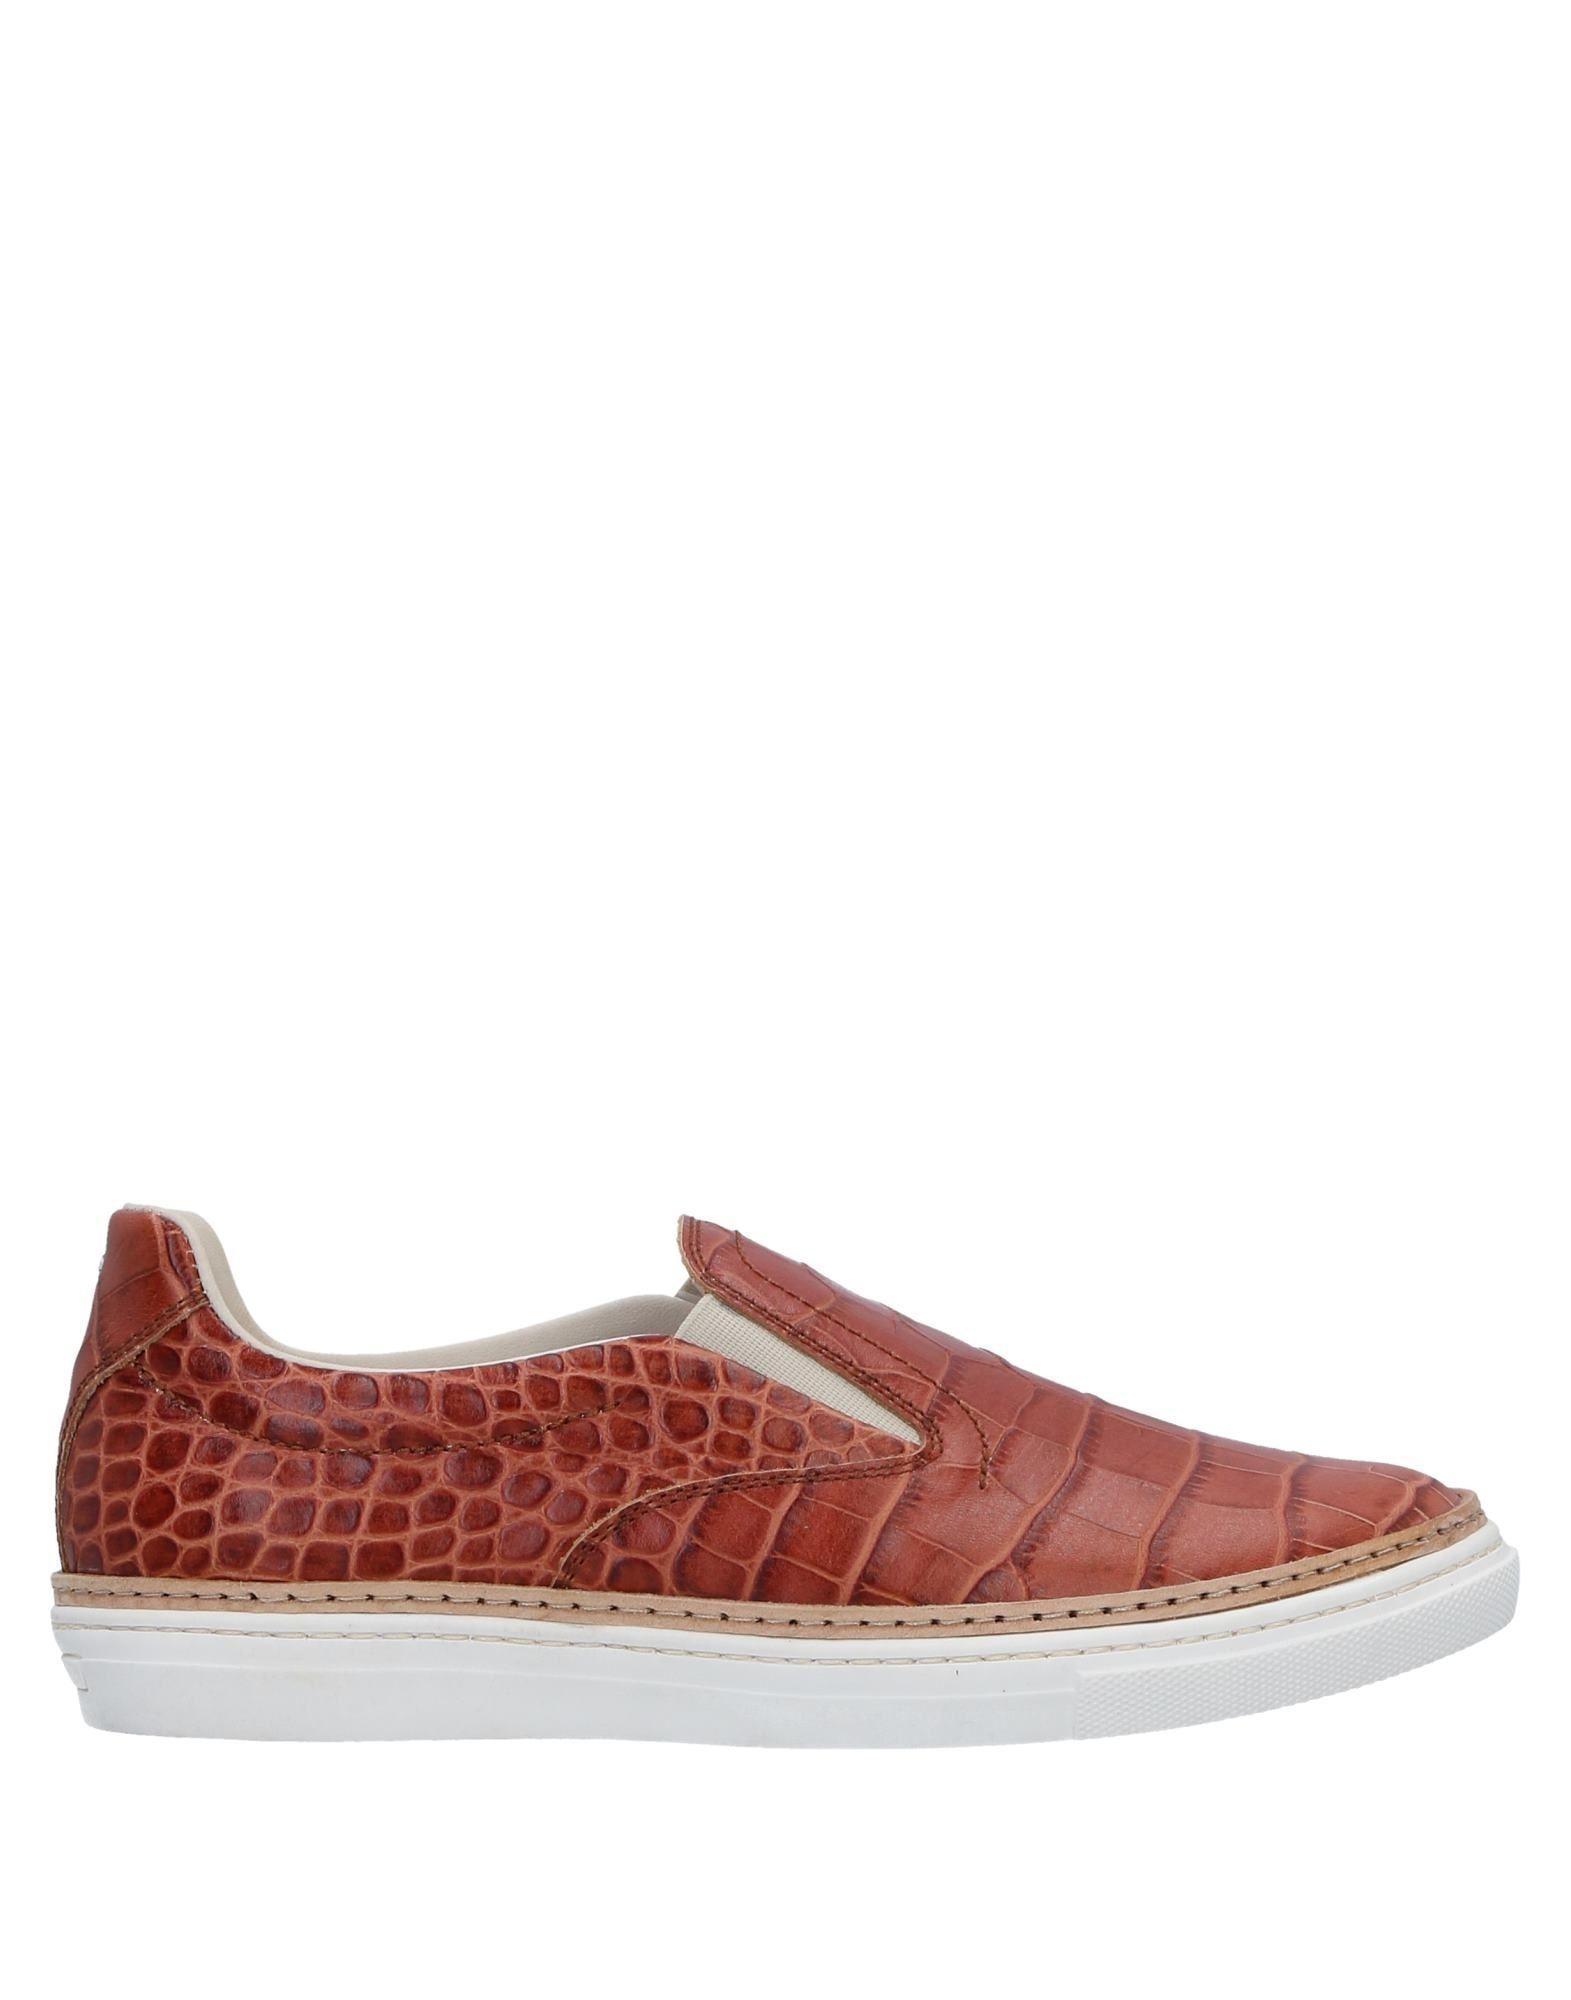 Maison Margiela Sneakers Damen  11498363SNGut aussehende strapazierfähige Schuhe